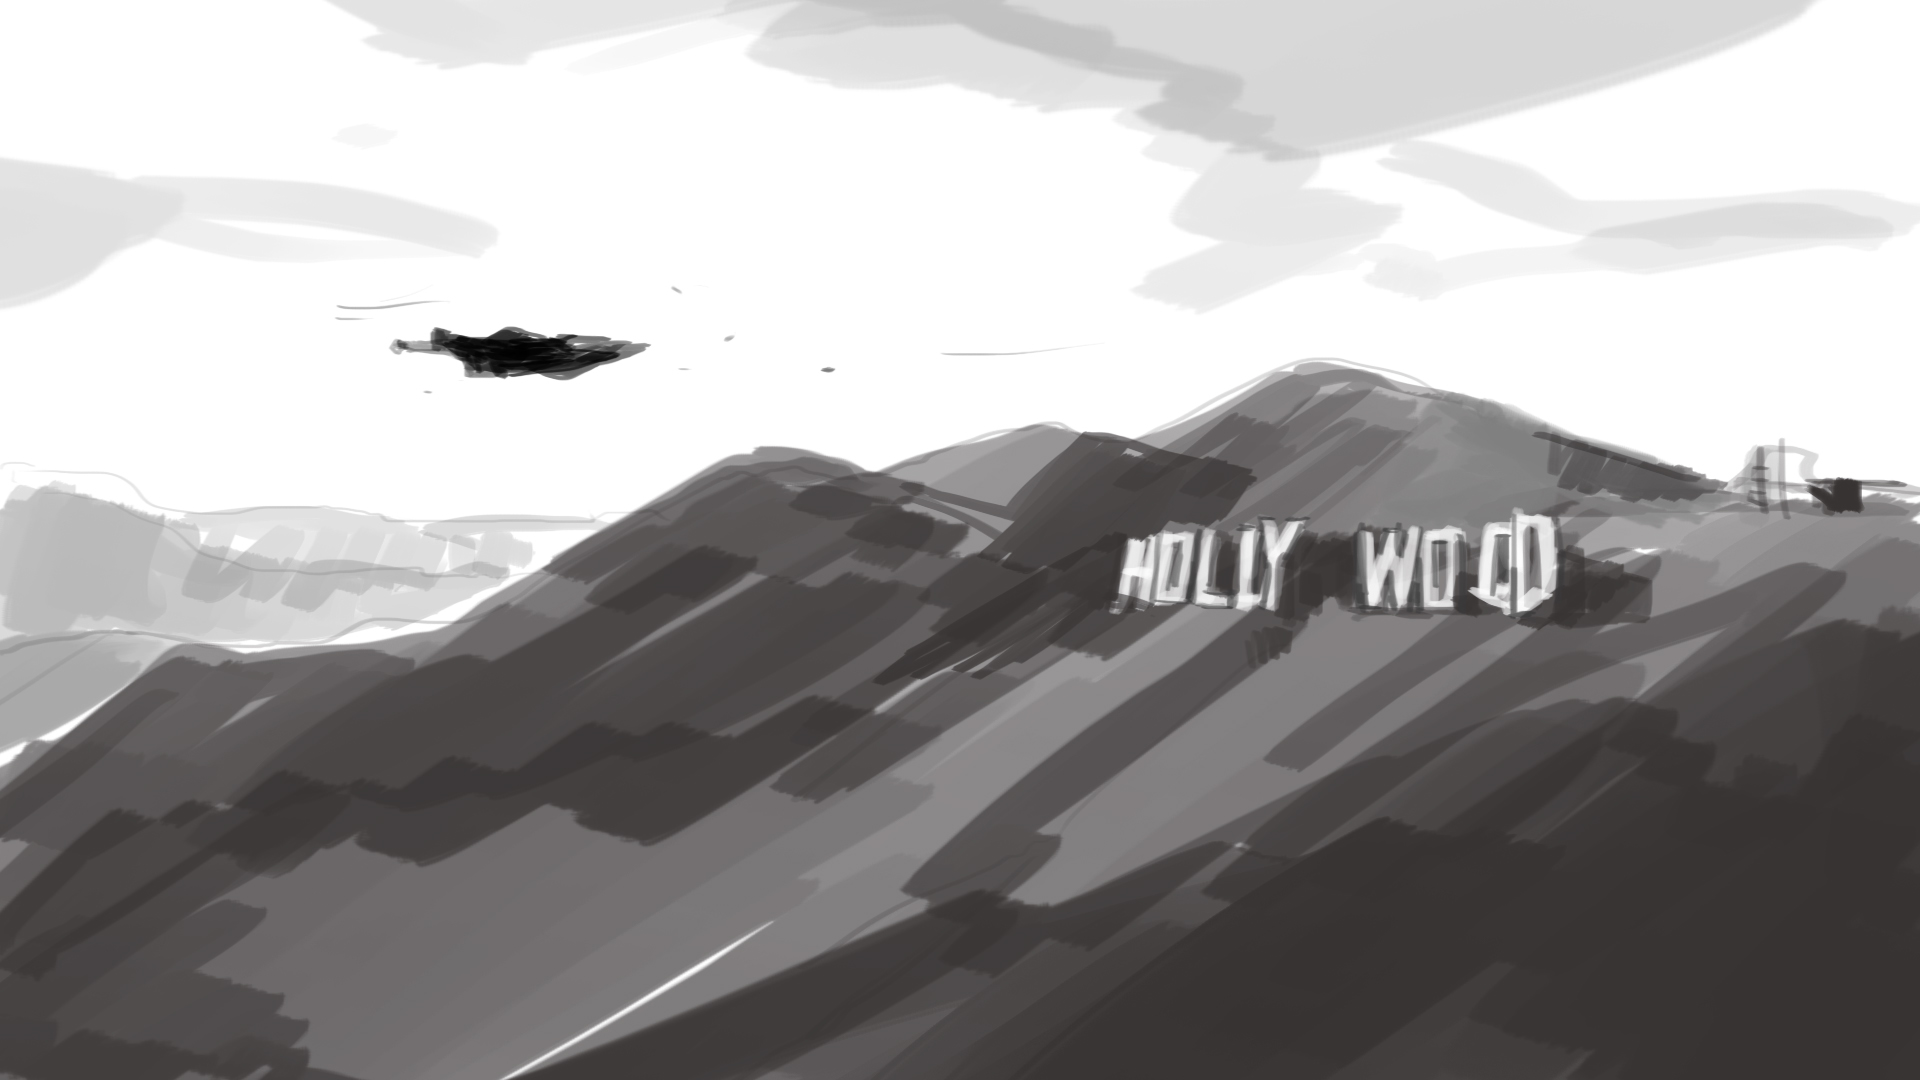 The Kid_Illustration26